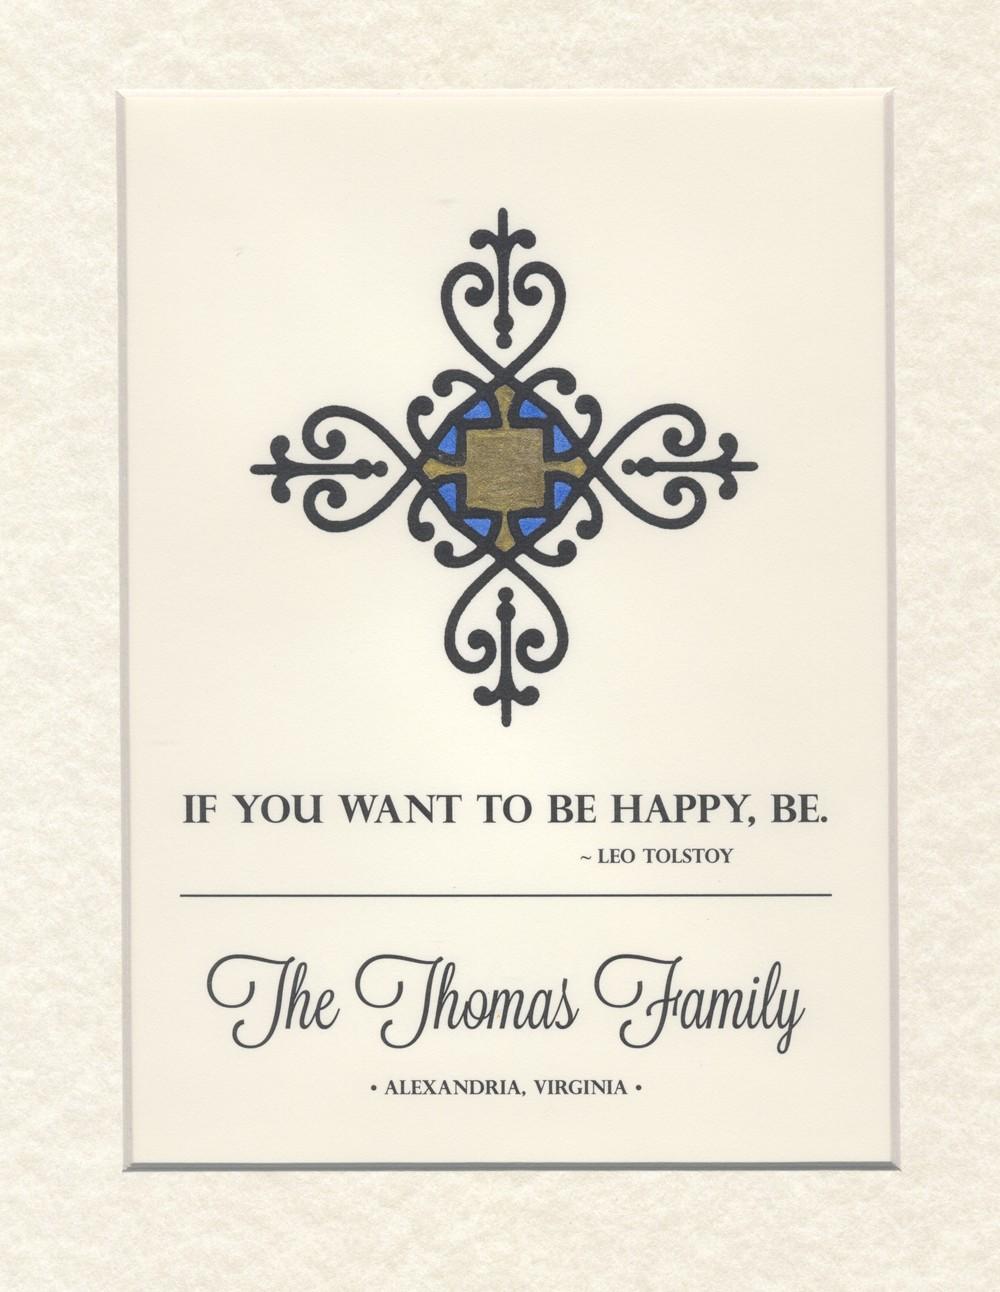 spanish cross.Thomas.jpg